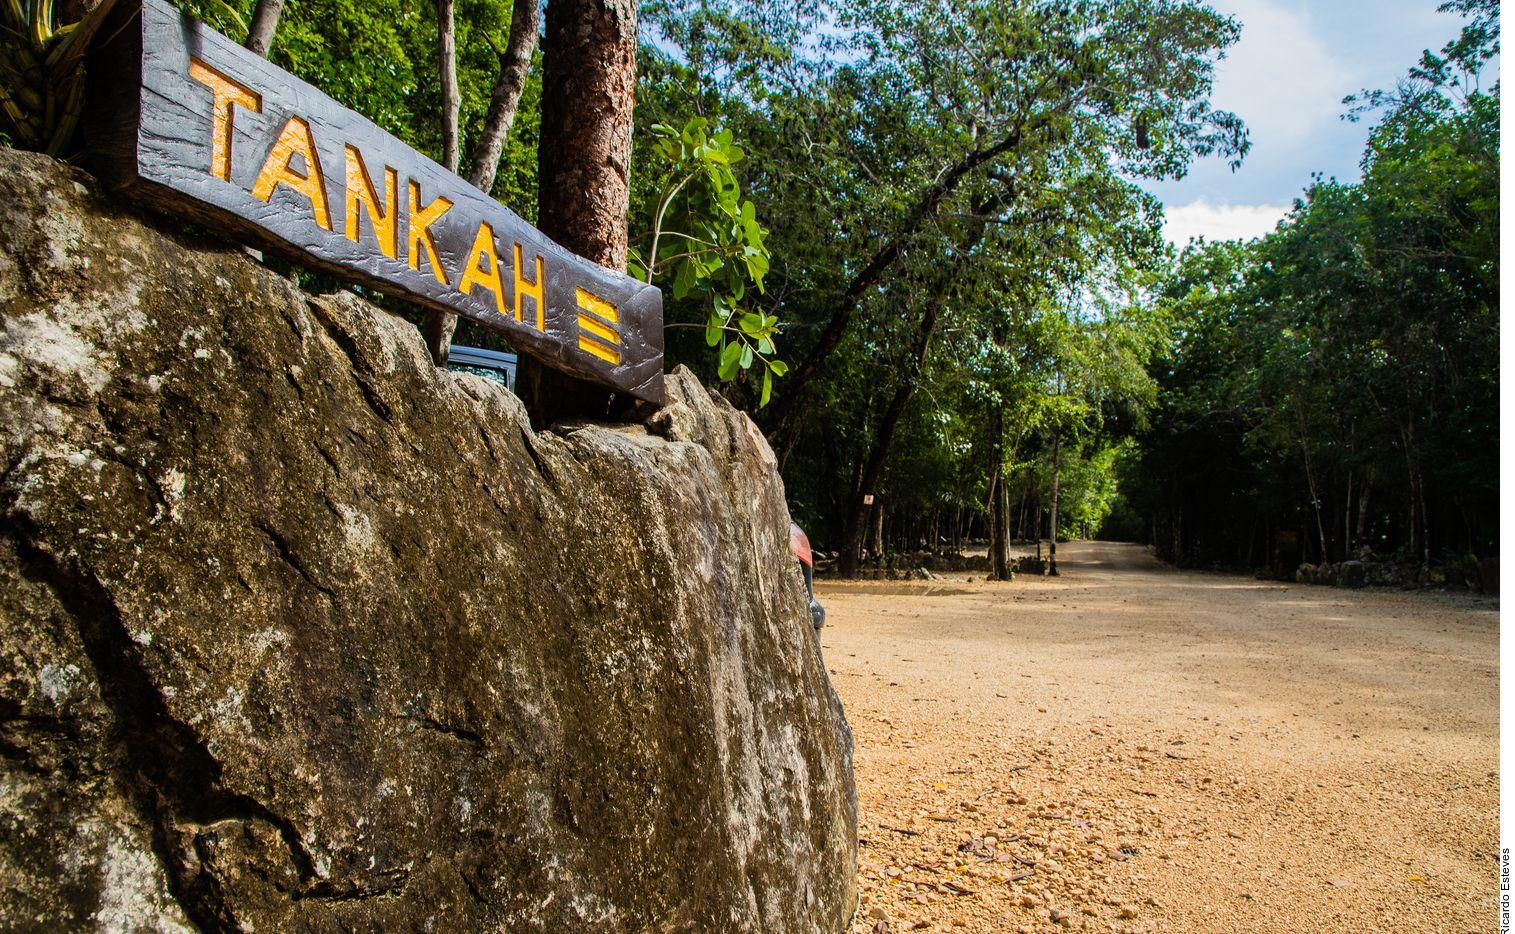 Al catálogo de divertimento en Tulum, Quintana Roo, se ha sumado un imperdible: la reserva natural de Tankah, ubicada a unos 20 minutos del centro.